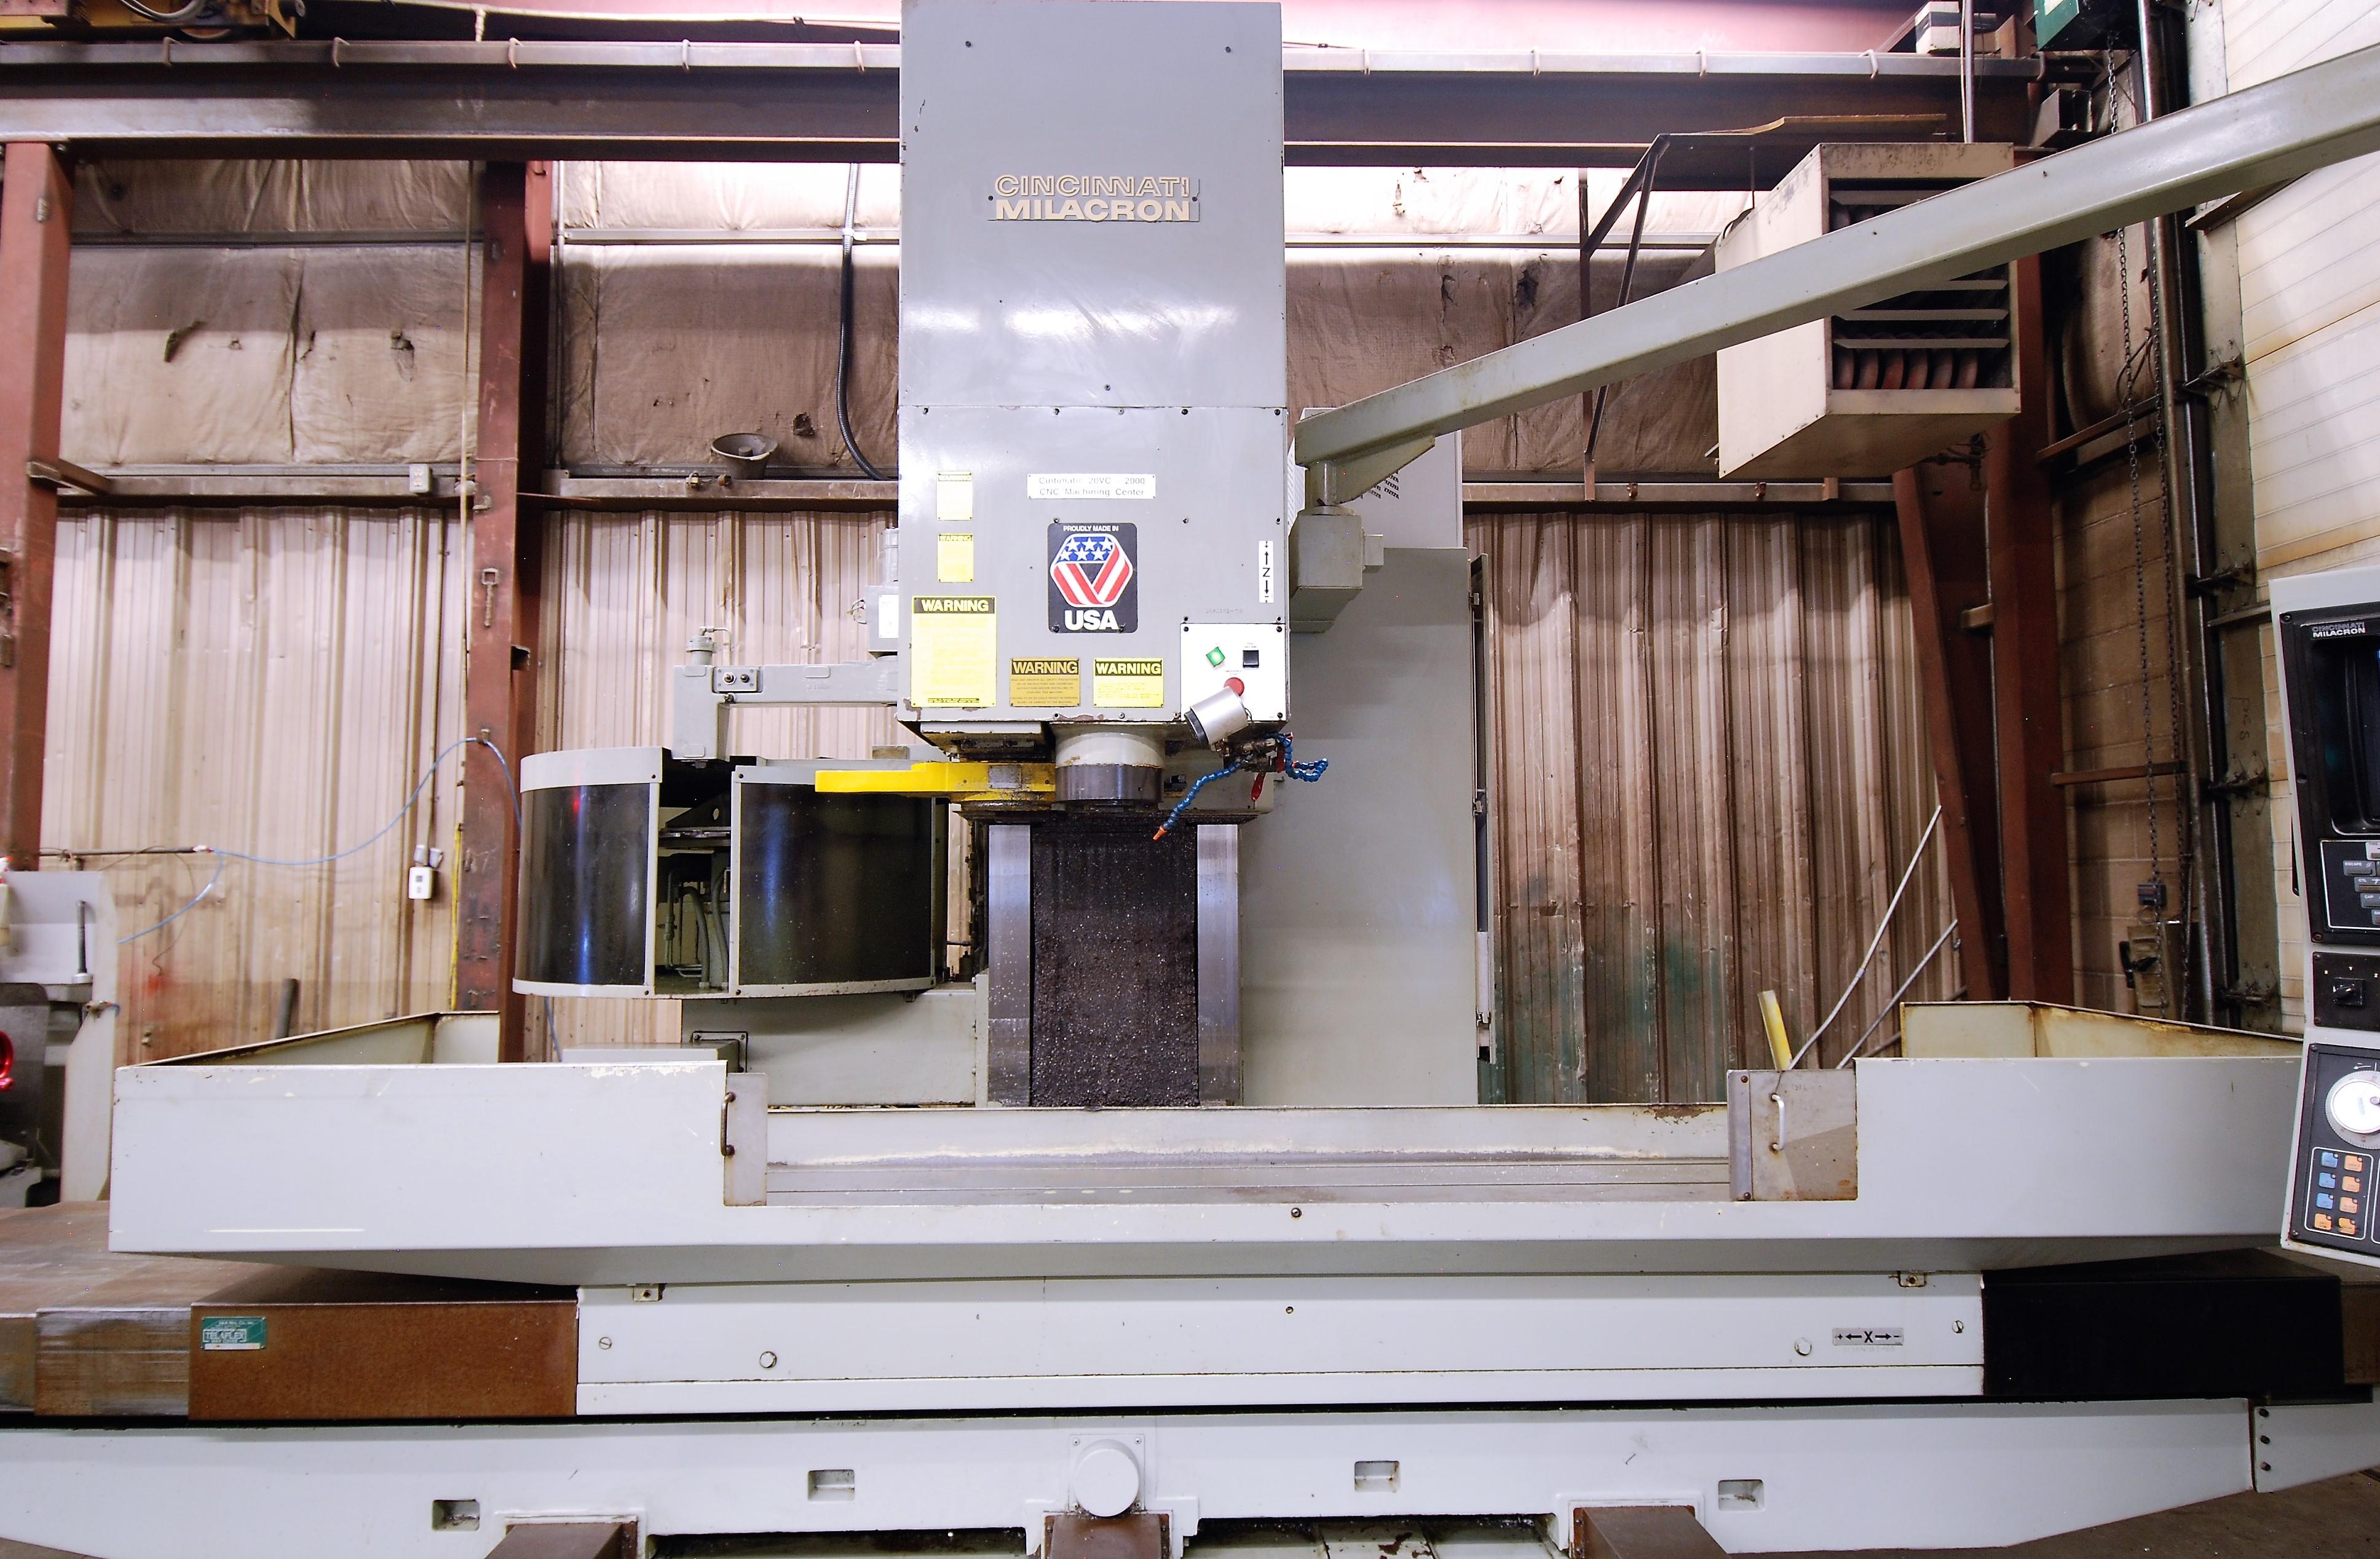 "CINCINNATI MILACRON20VC CNC VERTICAL MILLING MACHINING, 80"" x 30"" TABLE, ACRAMATIC 850SX CNC - Image 2 of 20"